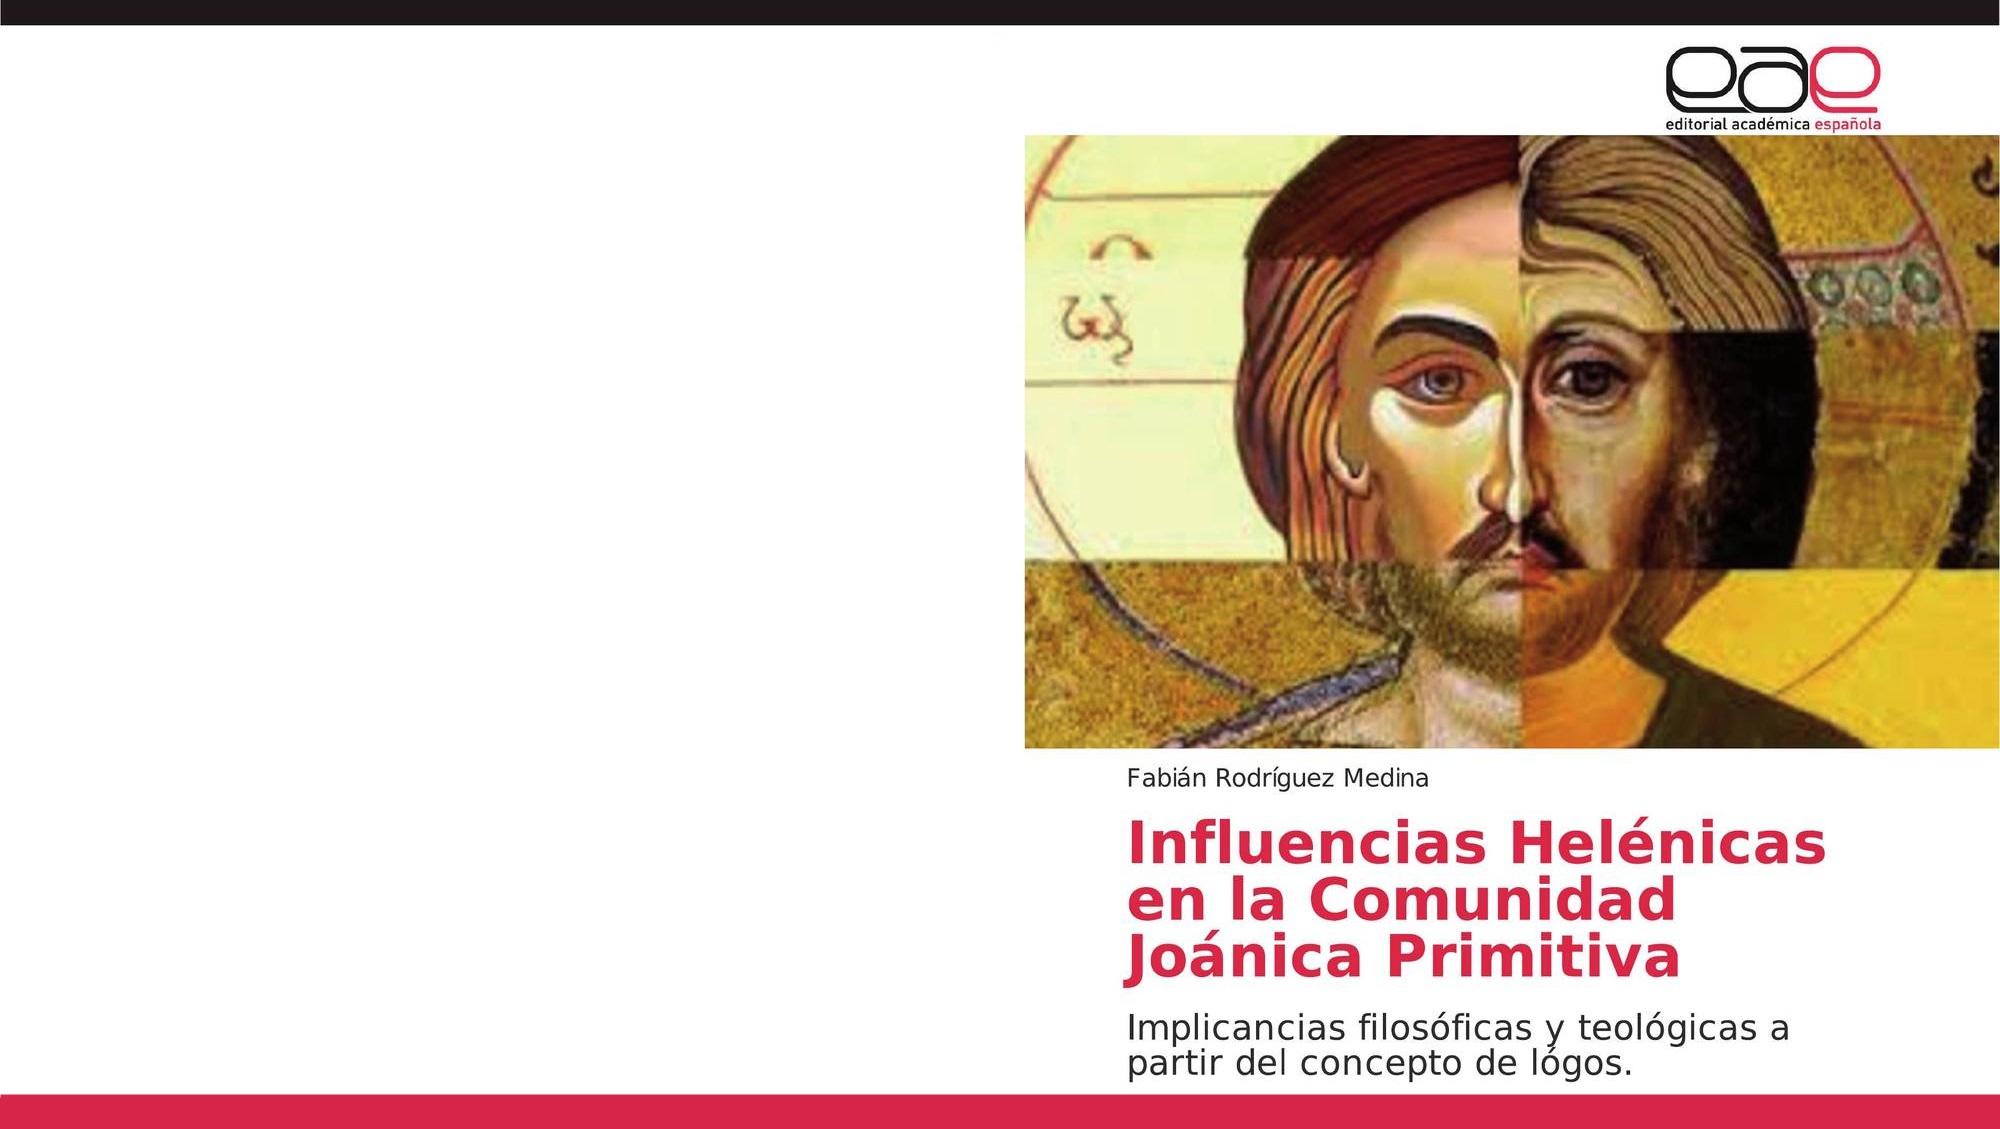 Libro de Fabián Rodríguez Medina